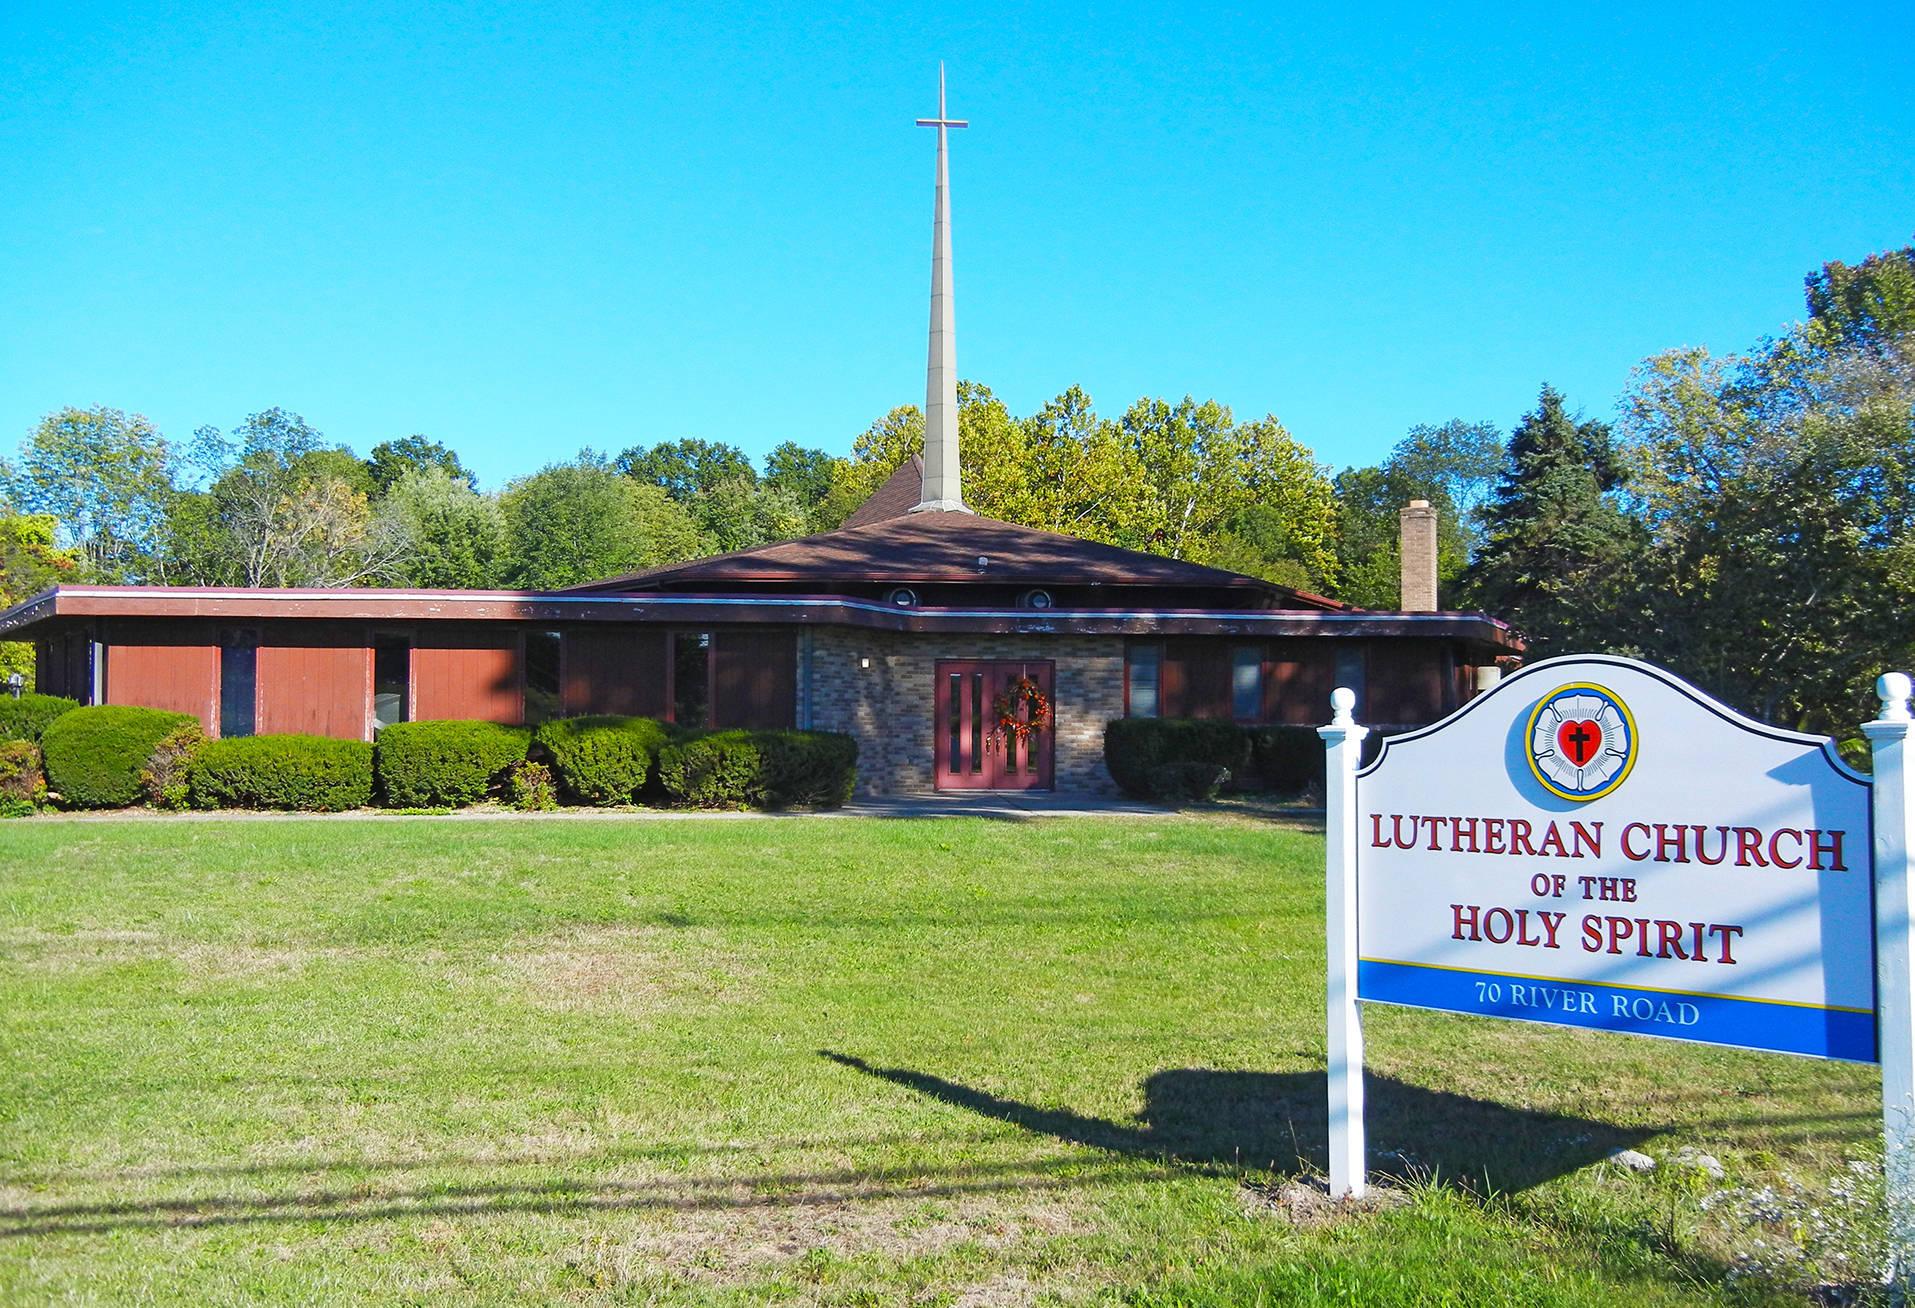 038531e71ab56e5c8bbf_Lutheran_Church_of_the_Holy_Spirit.jpg